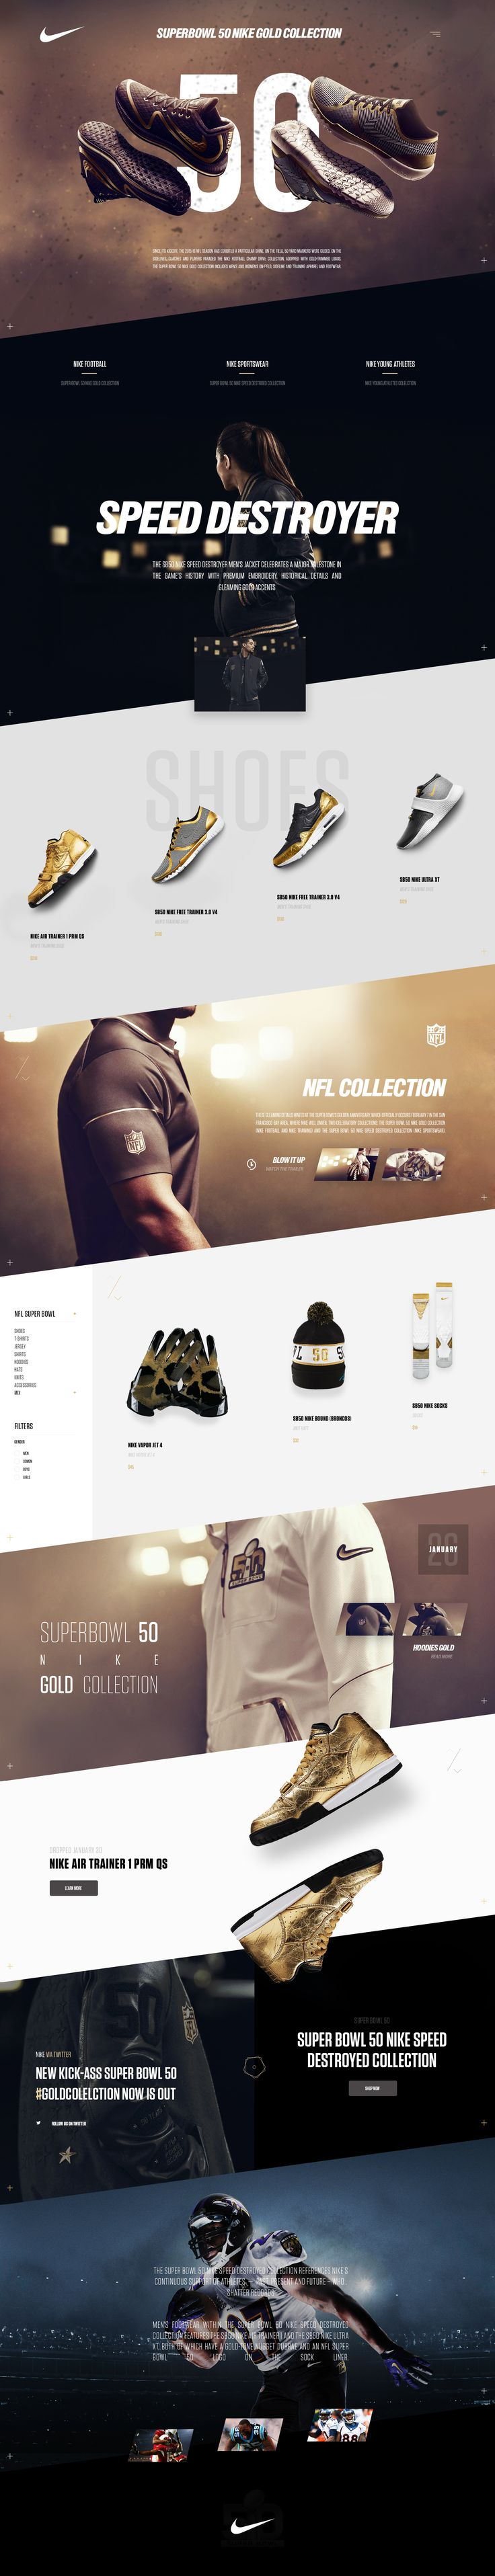 Nike 50's SuperBowl Anniversary #dribbble #ui #ux #webdesign #nike